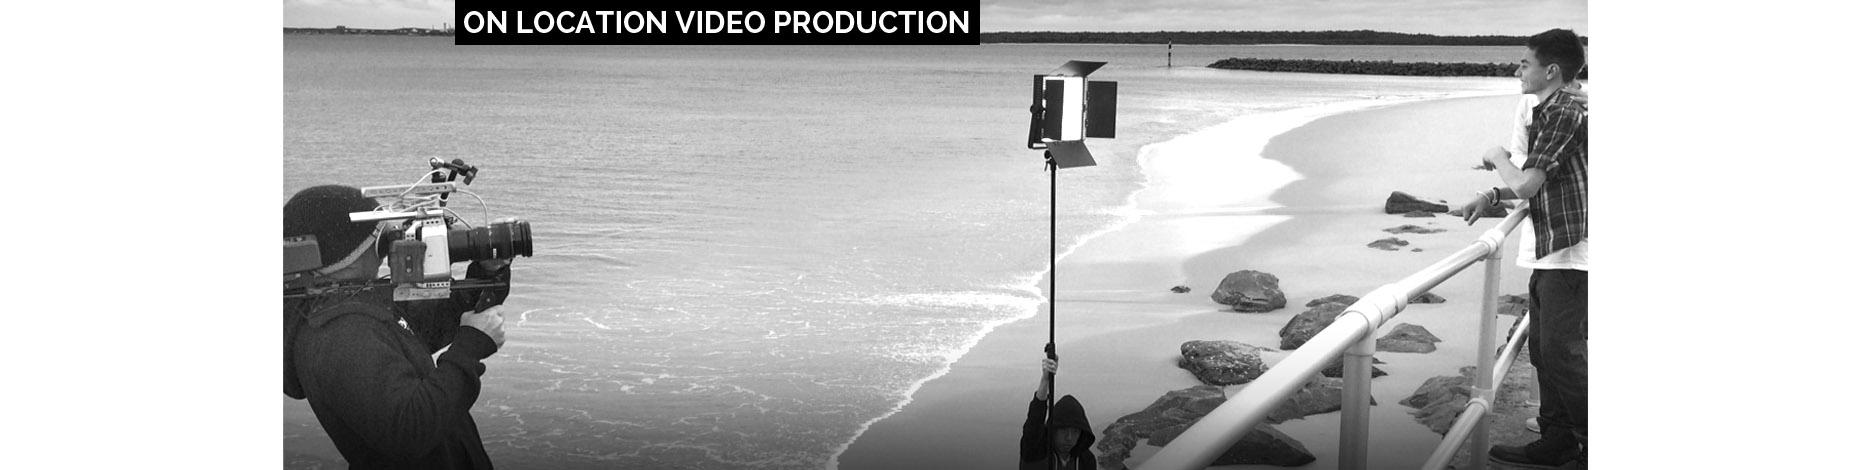 Film, TV Video Production & Marketing Company Sydney